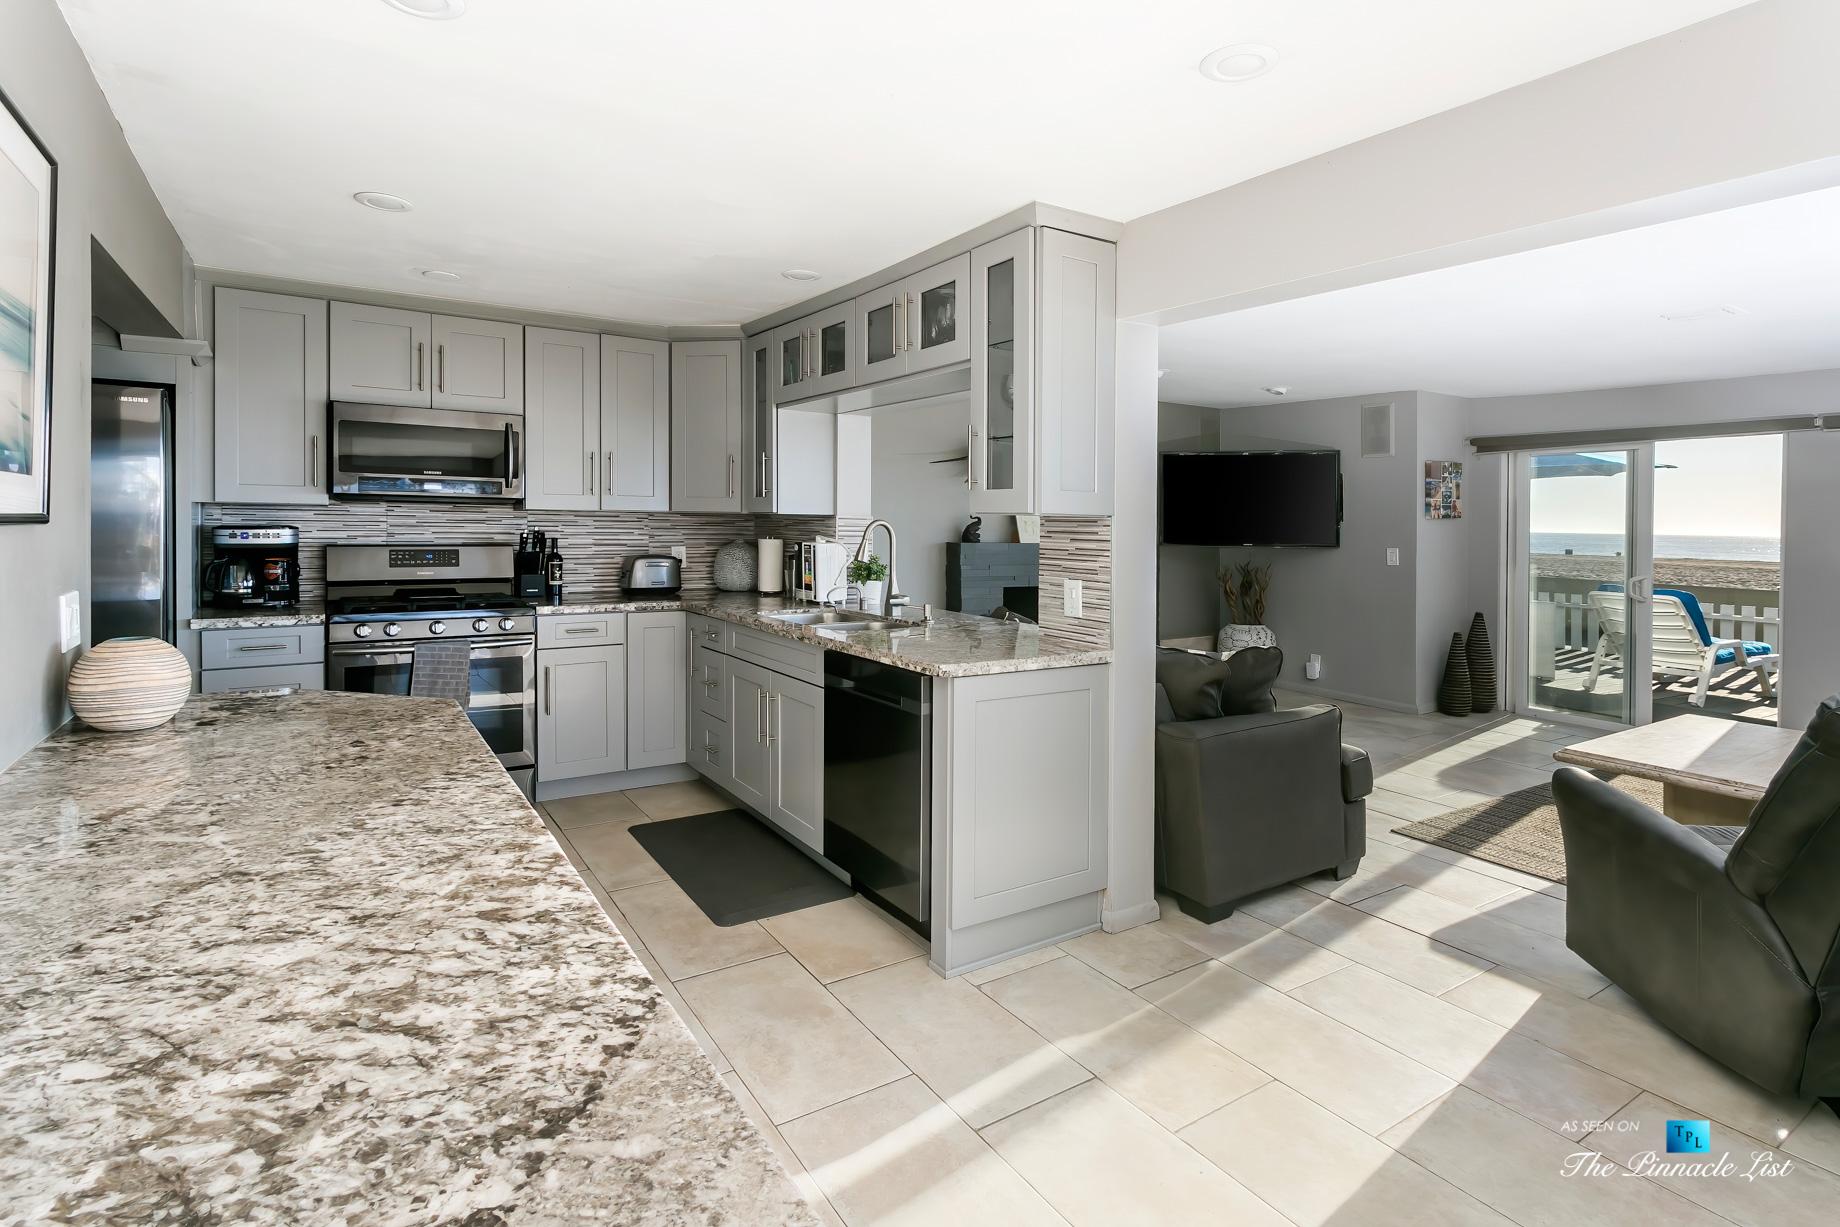 3500 The Strand, Hermosa Beach, CA, USA – Kitchen – Luxury Real Estate – Original 90210 Beach House – Oceanfront Home